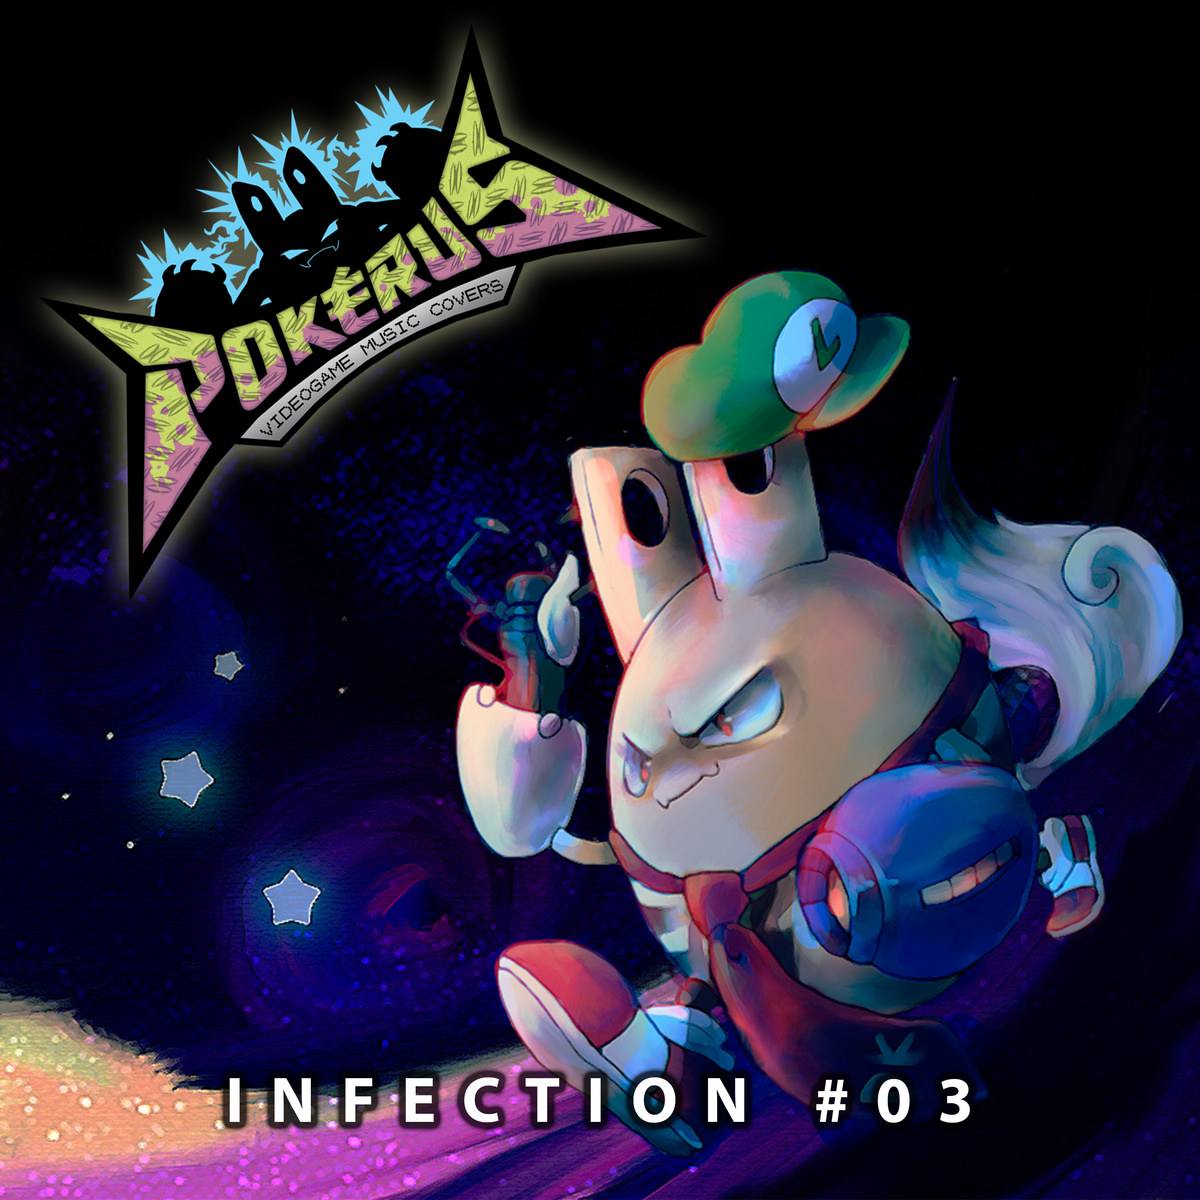 Pokérus - Infection #03